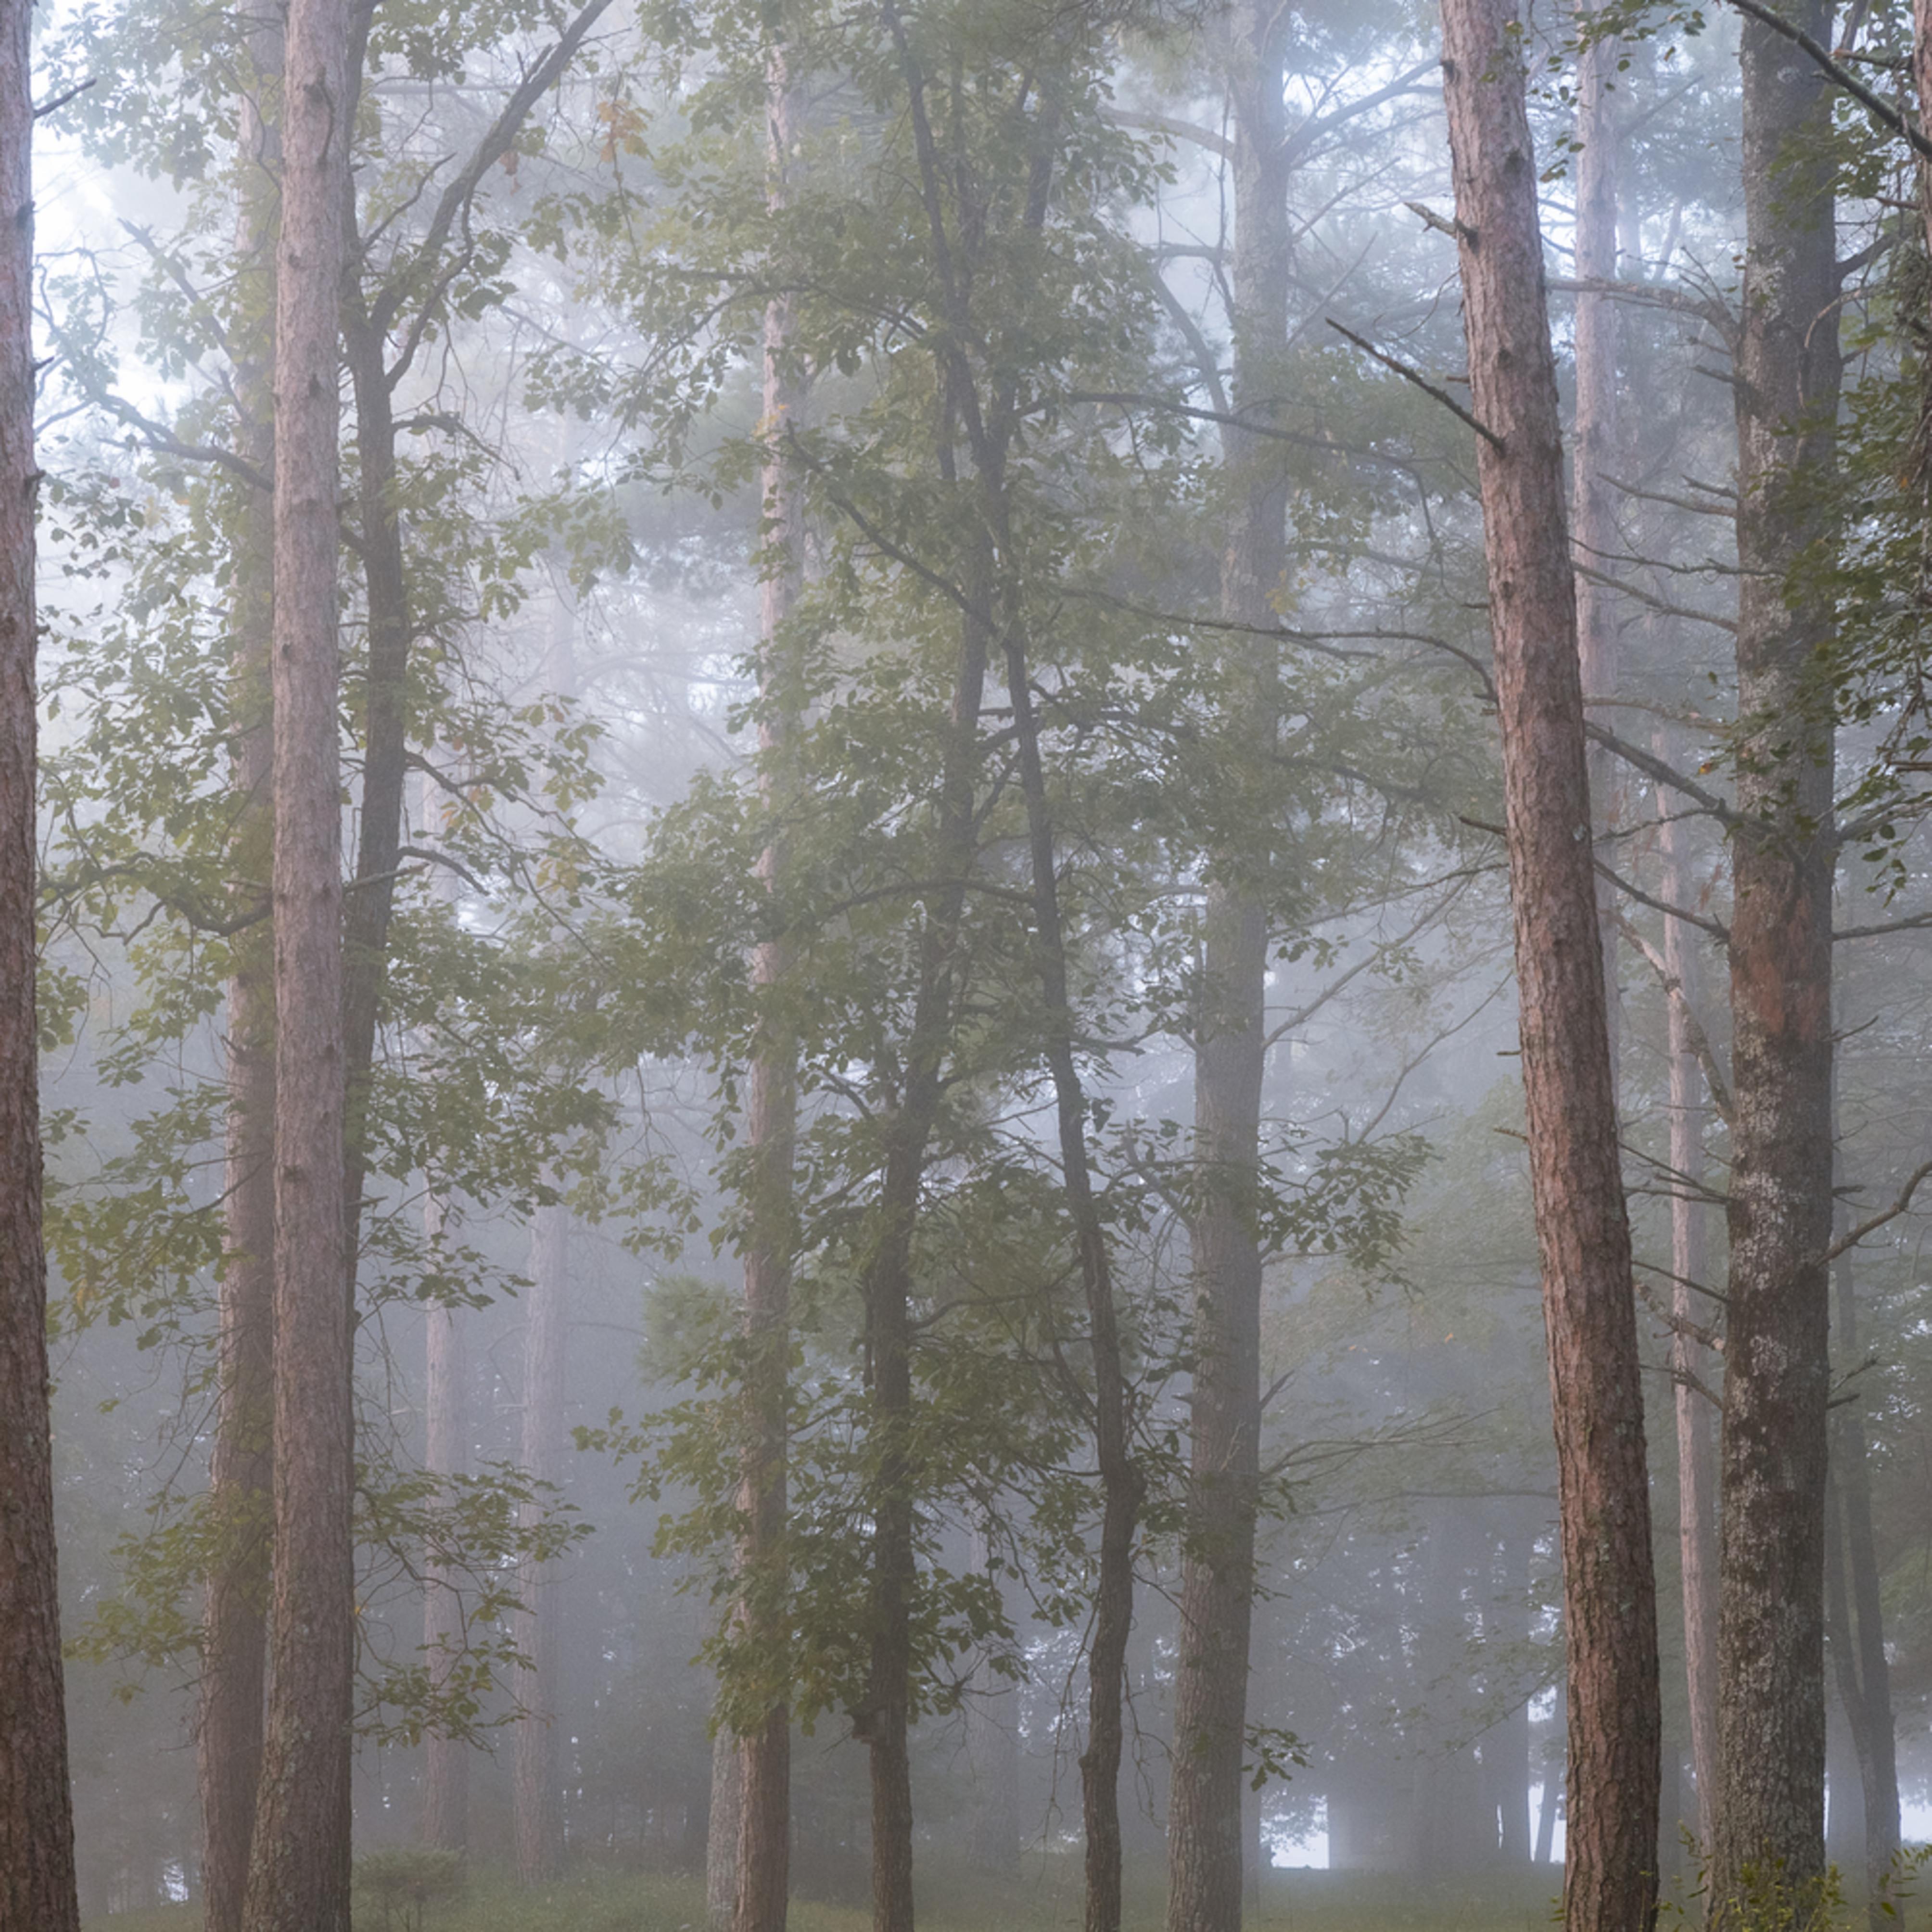 Misty forest zlpmnm